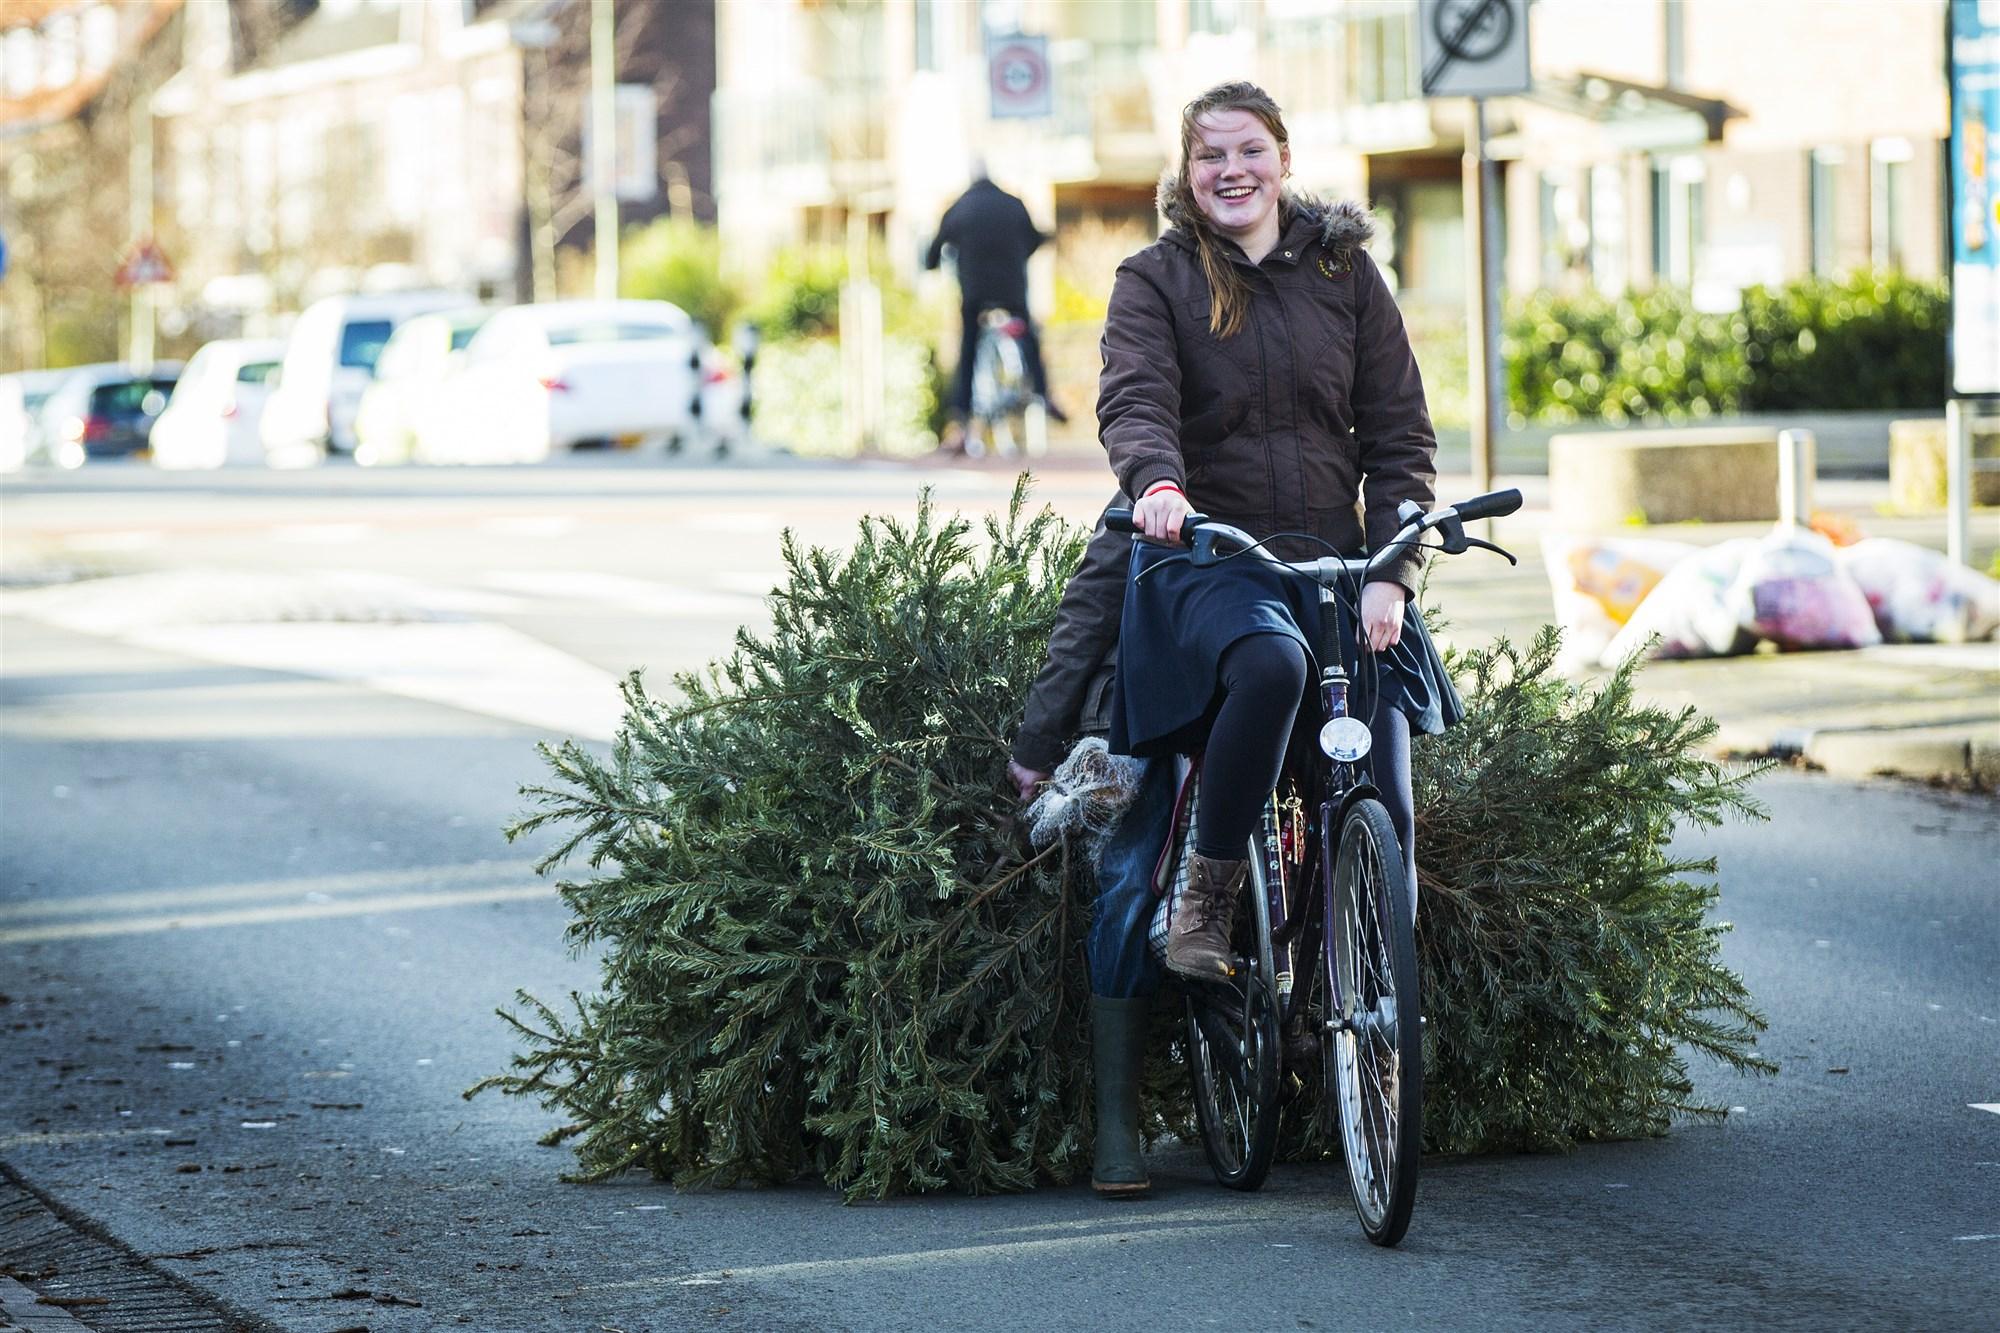 kerstboom op straat